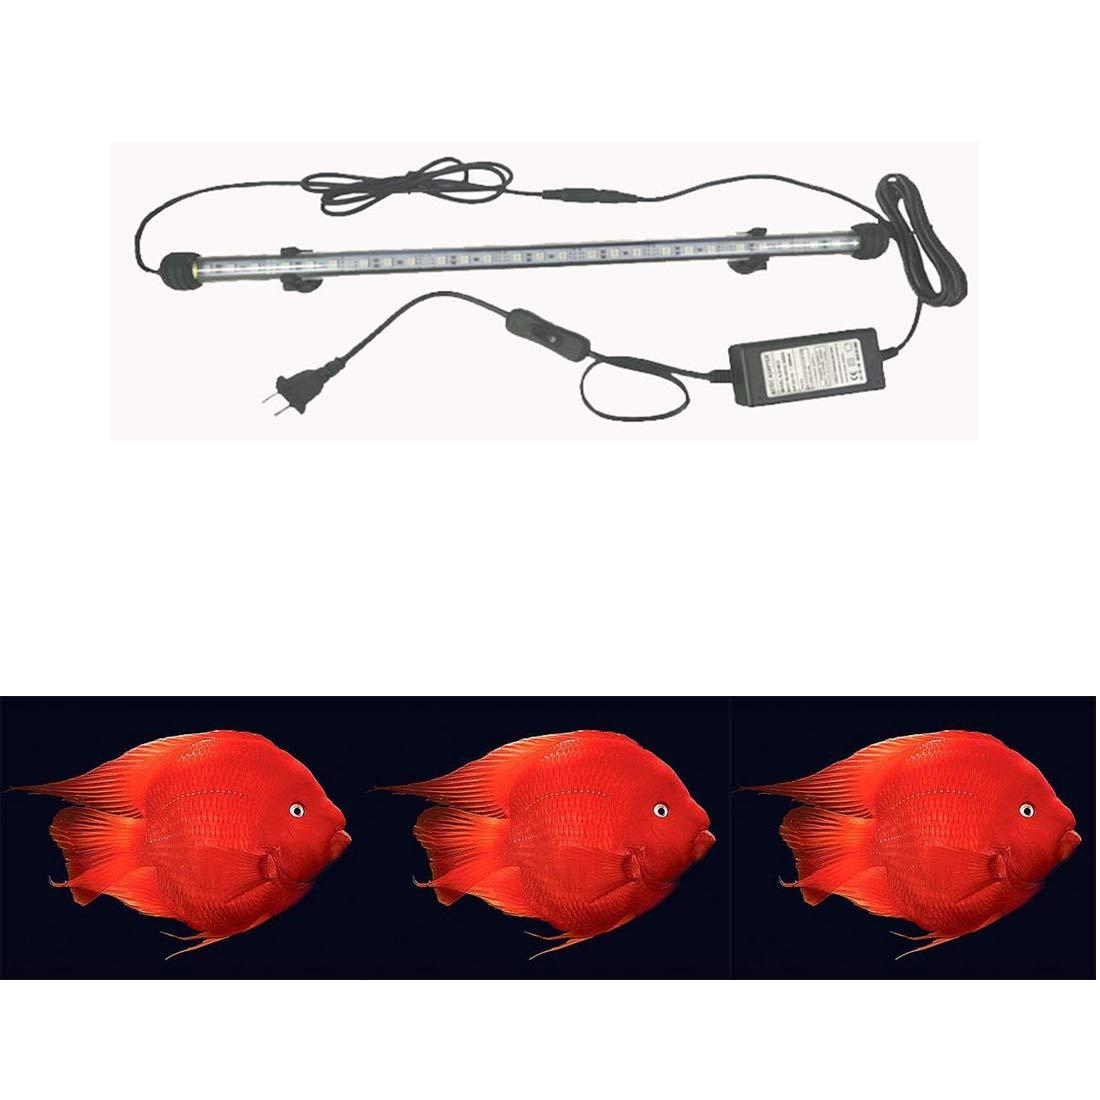 1.4m Red Fish Tank Light Waterproof LED Lamp Aquarium Brighten Diving Lighting for Amphilophus Fish,1.11.4m,1.4m